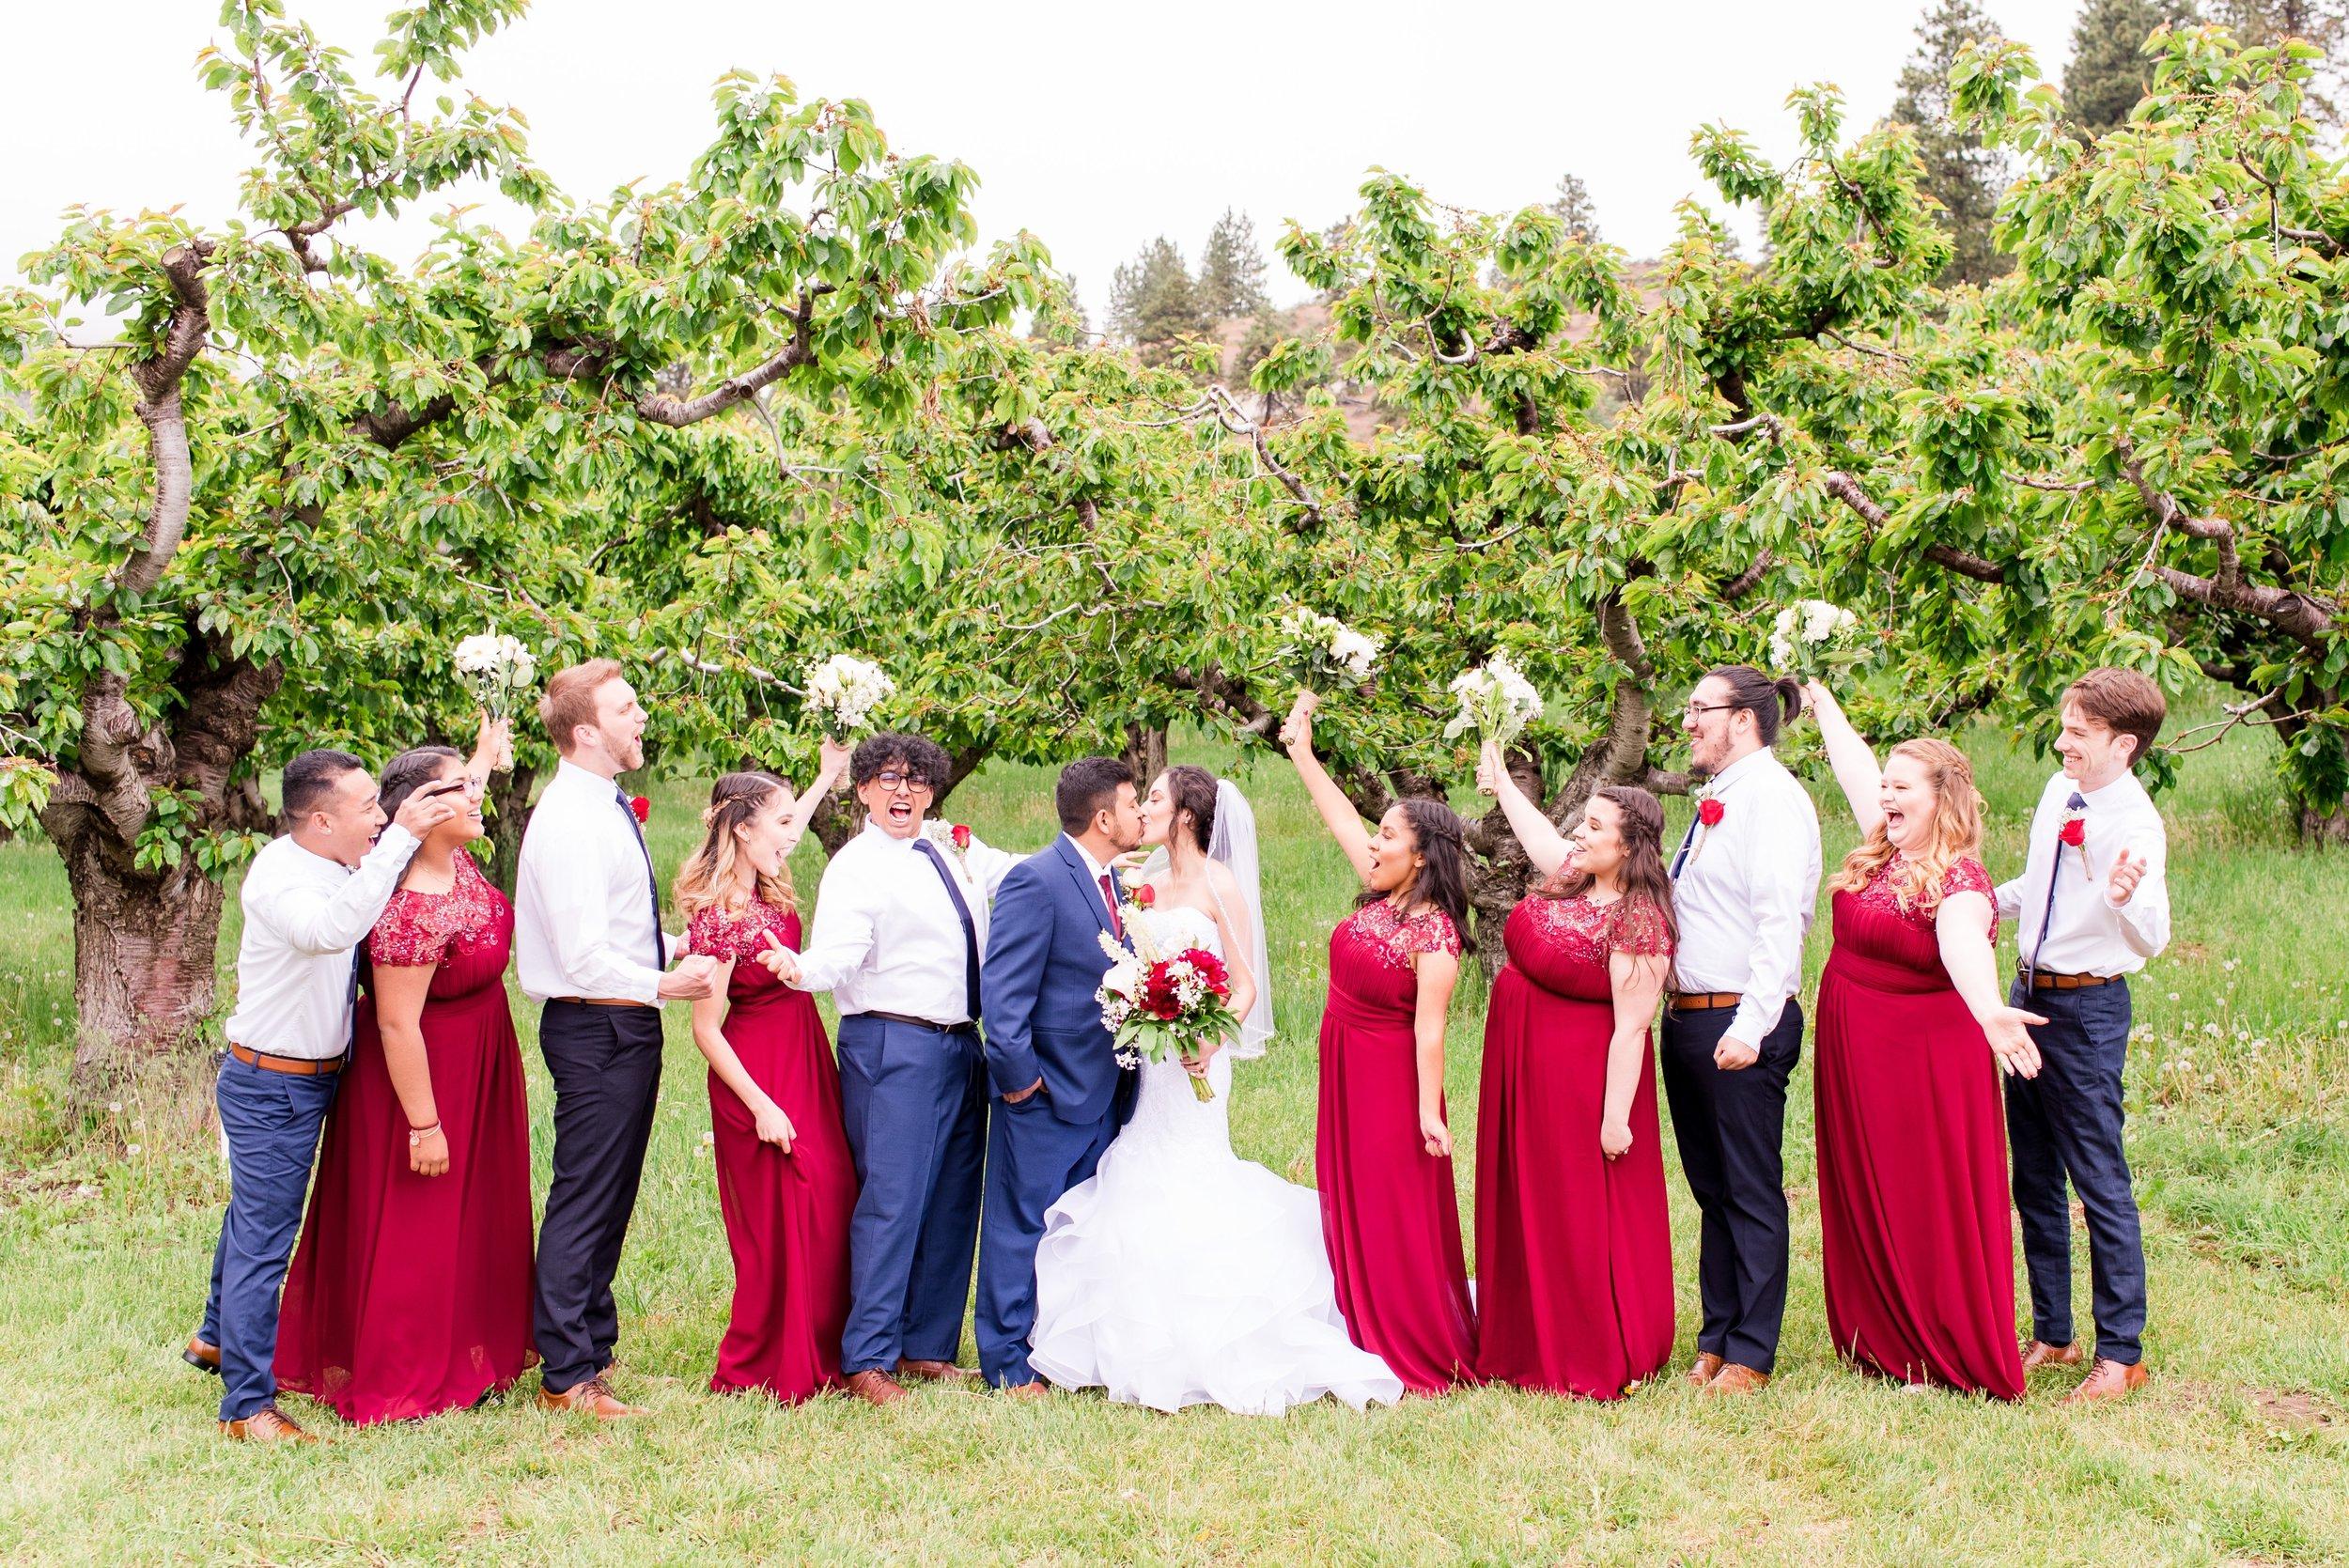 Bridal Party Orchard Photos - Wenatchee, WA Hampton Hideaway White Barn Wedding - Wenatchee, Washington Wedding Photographer - Morgan Tayler Photo & Design - Tri Cities, WA Wedding Photographer